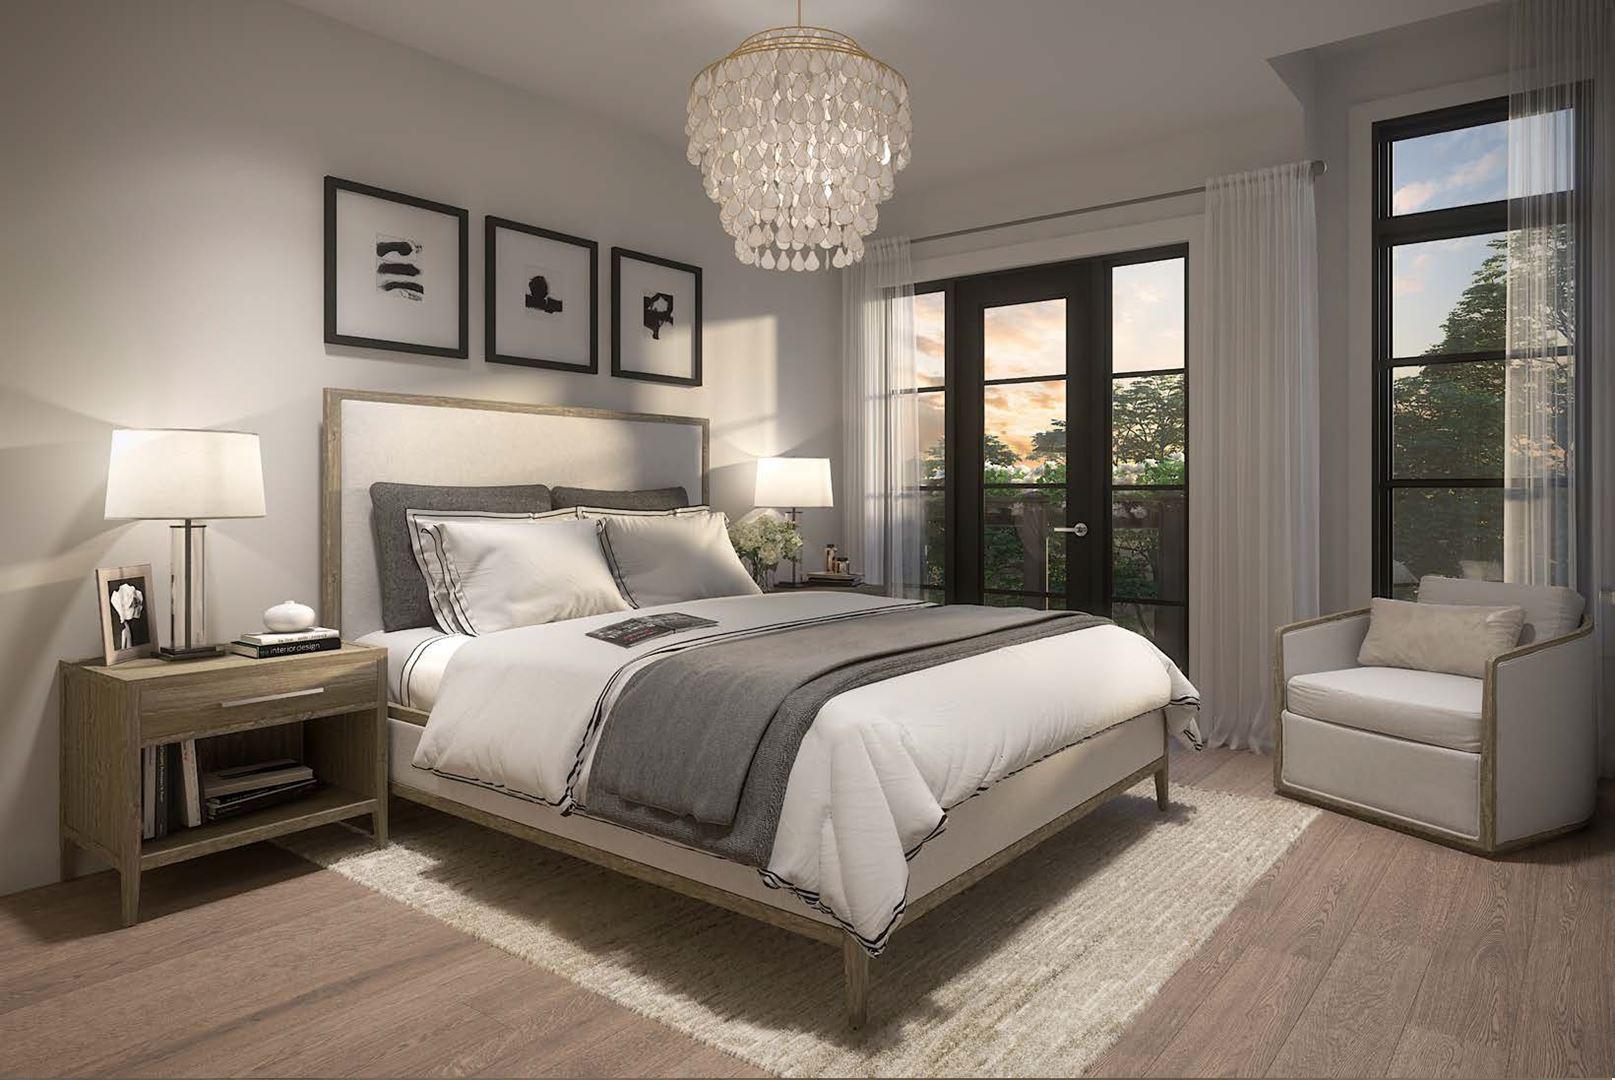 Archetto Woodbridge Towns bedroom